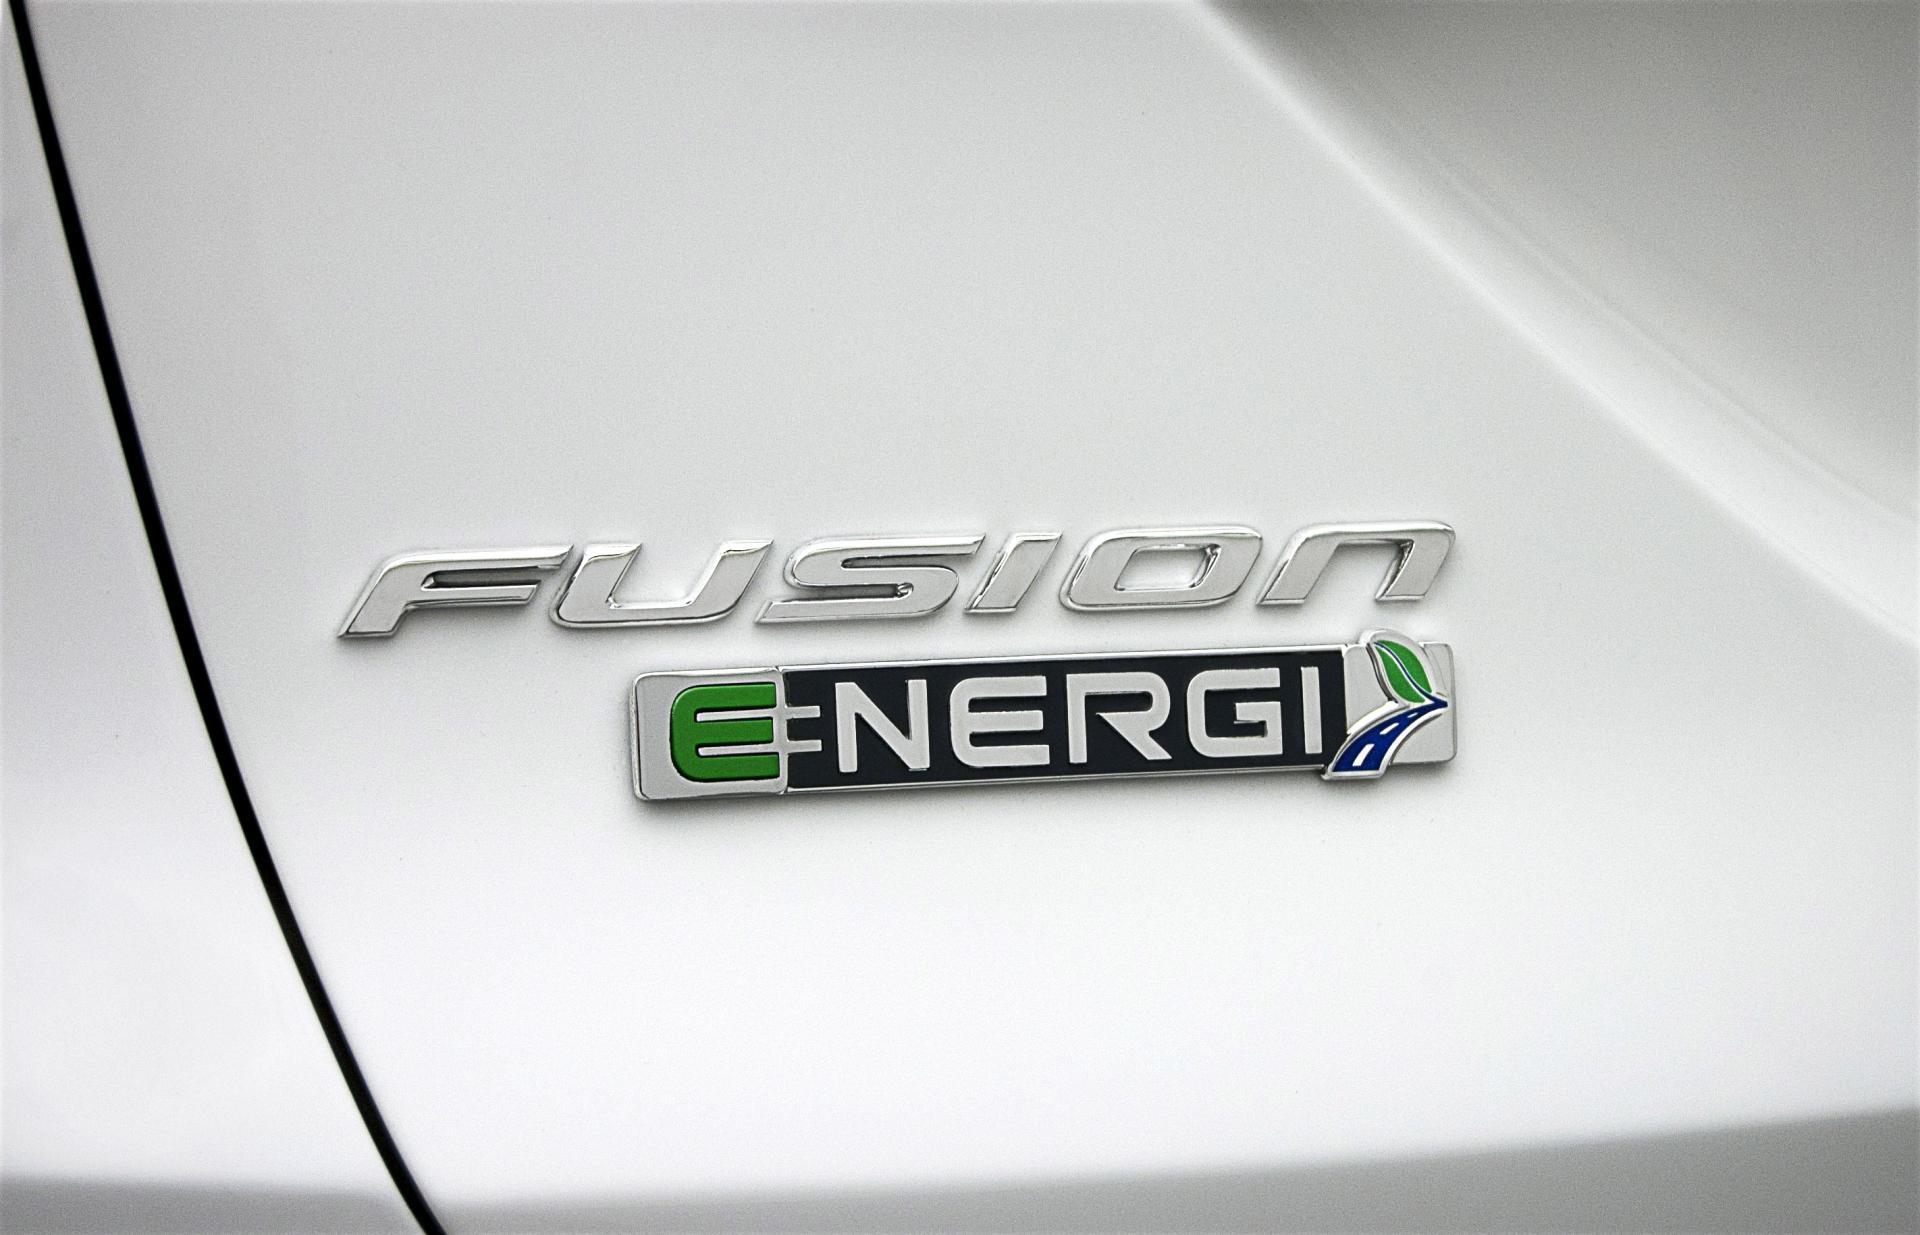 2013 Ford Fusion Energi Image